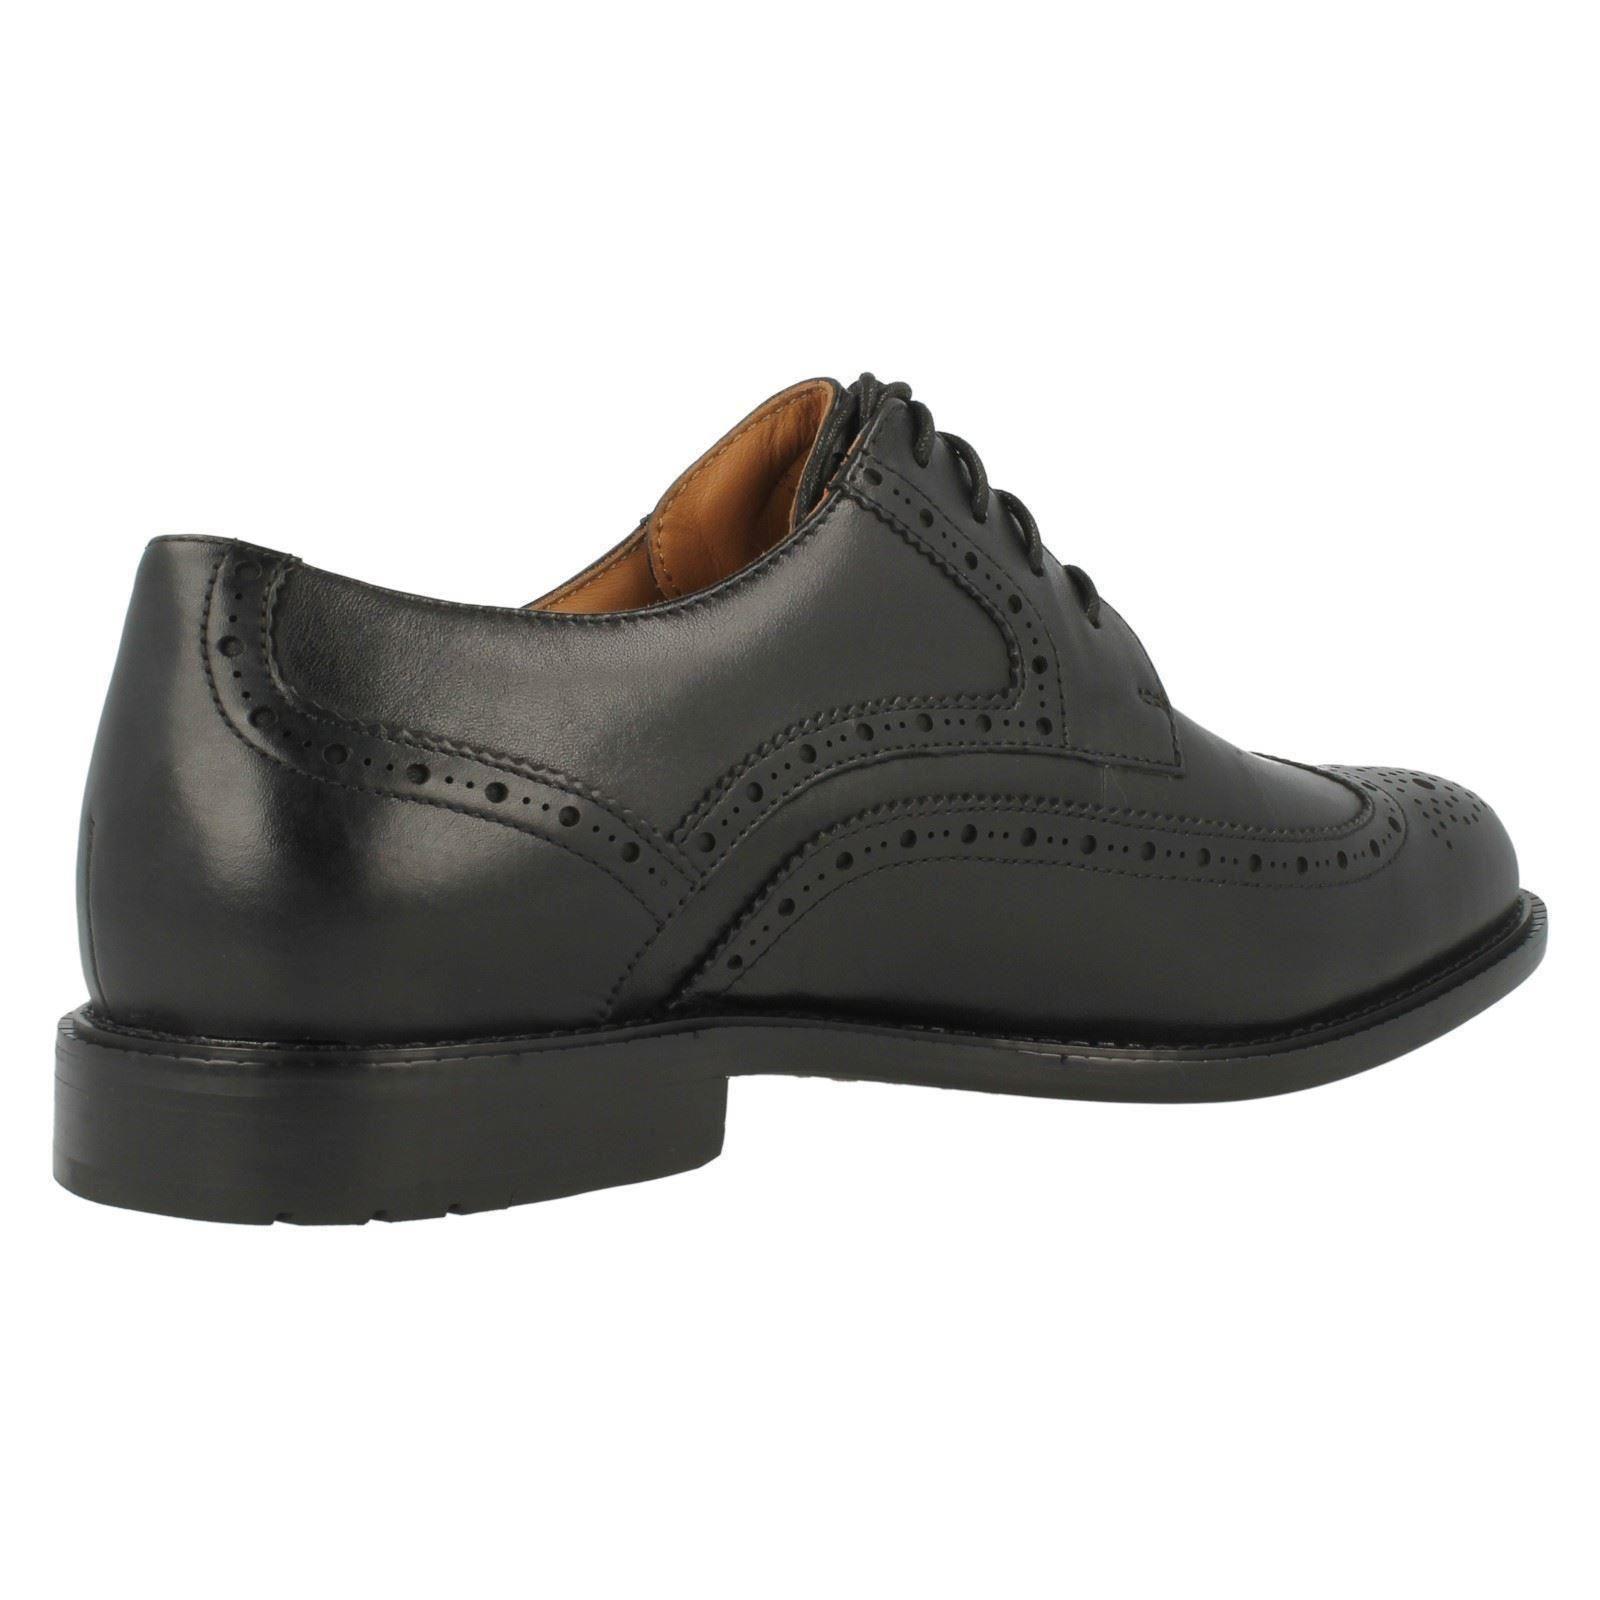 Mens Clarks Formal Lace Up Brogue Shoes Shoes Shoes Dorset Limit 3948ae